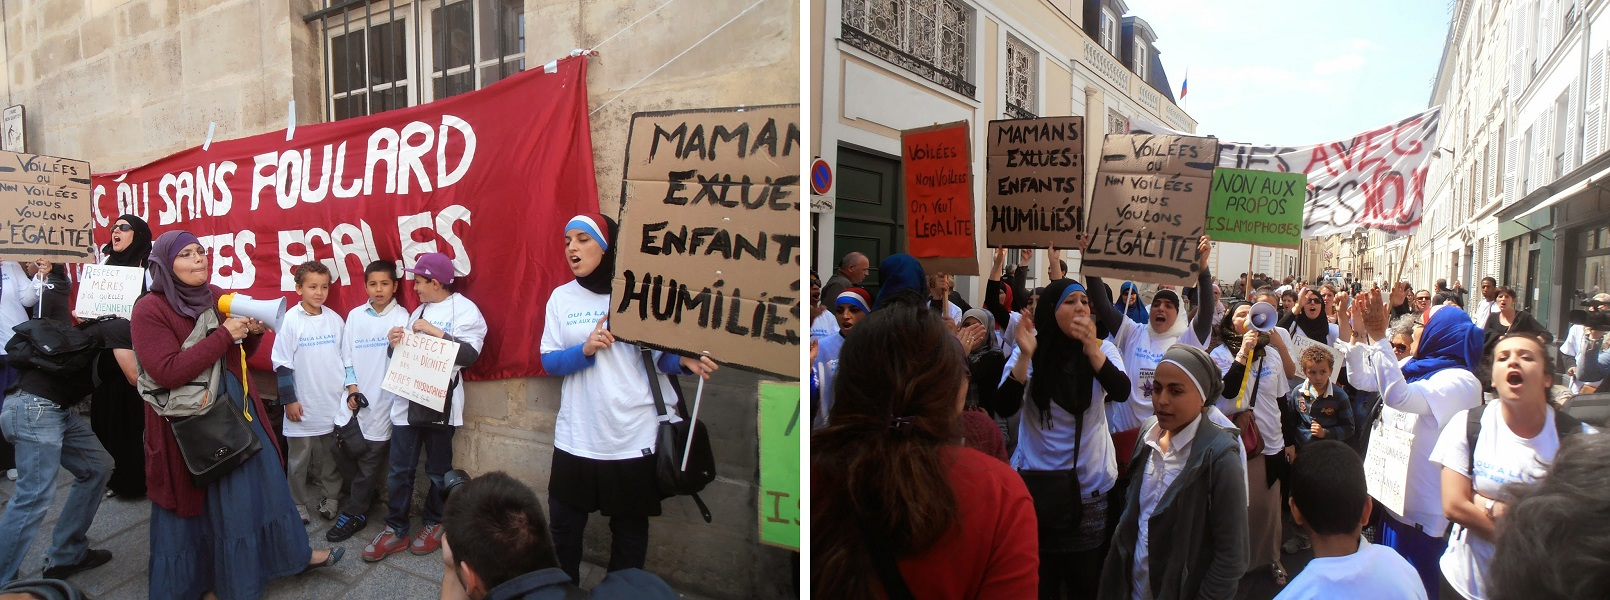 Paris protest against Chatel circular June 2014